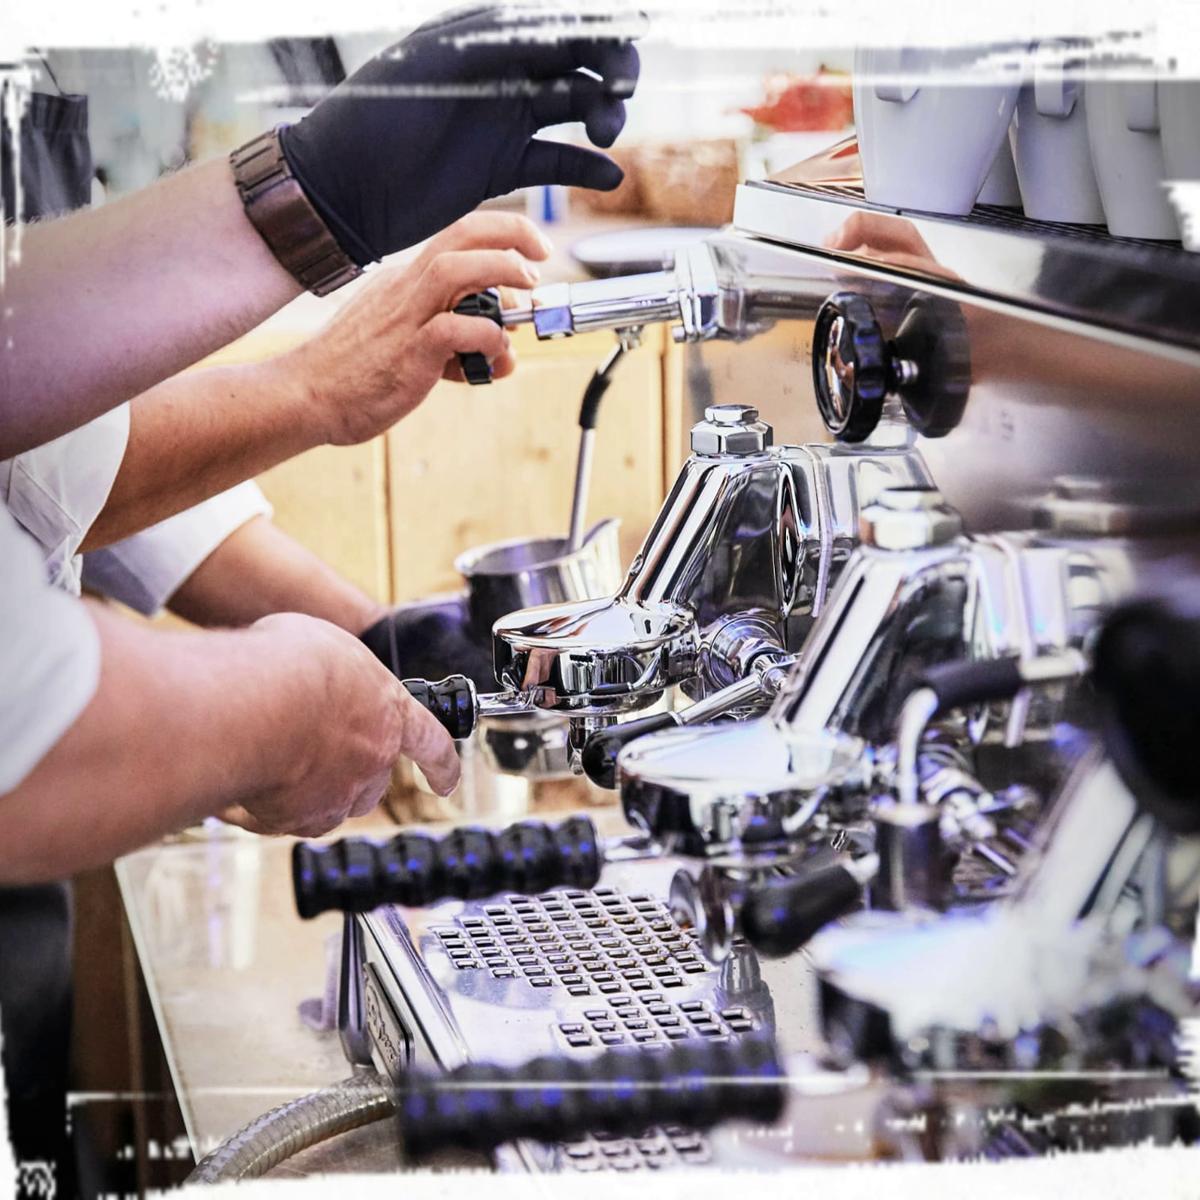 Kaffeecatering Baristaservice Messen